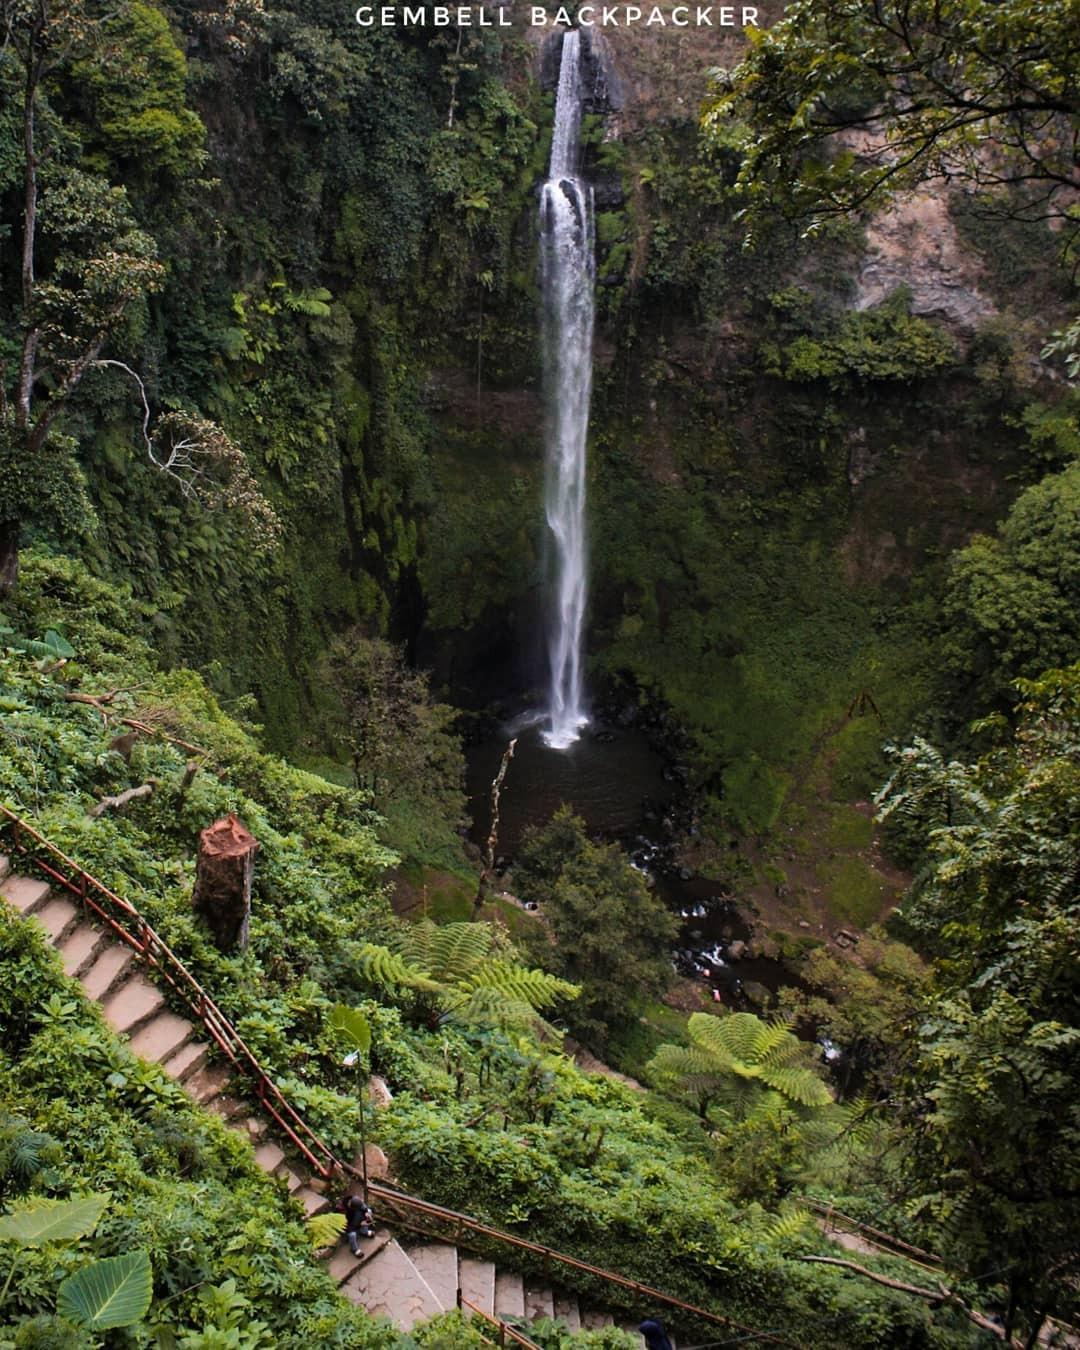 Air Terjun Pelangi atau Curug Cimahi, Lembang, Bandung, Jawa Barat